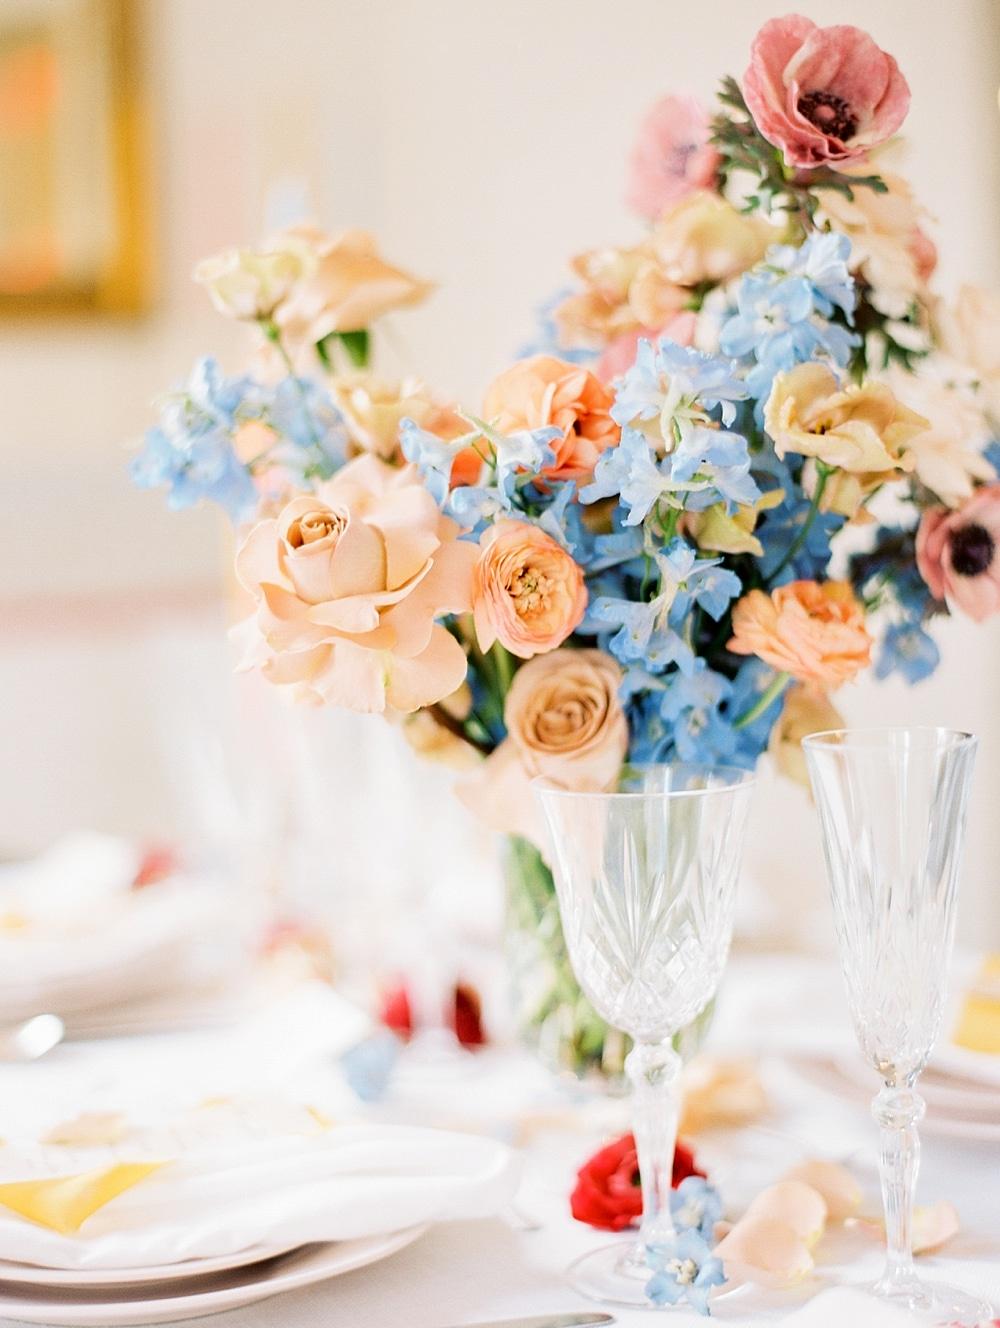 kristin-la-voie-photography-austin-wedding-photographer-woodbine-mansion-183